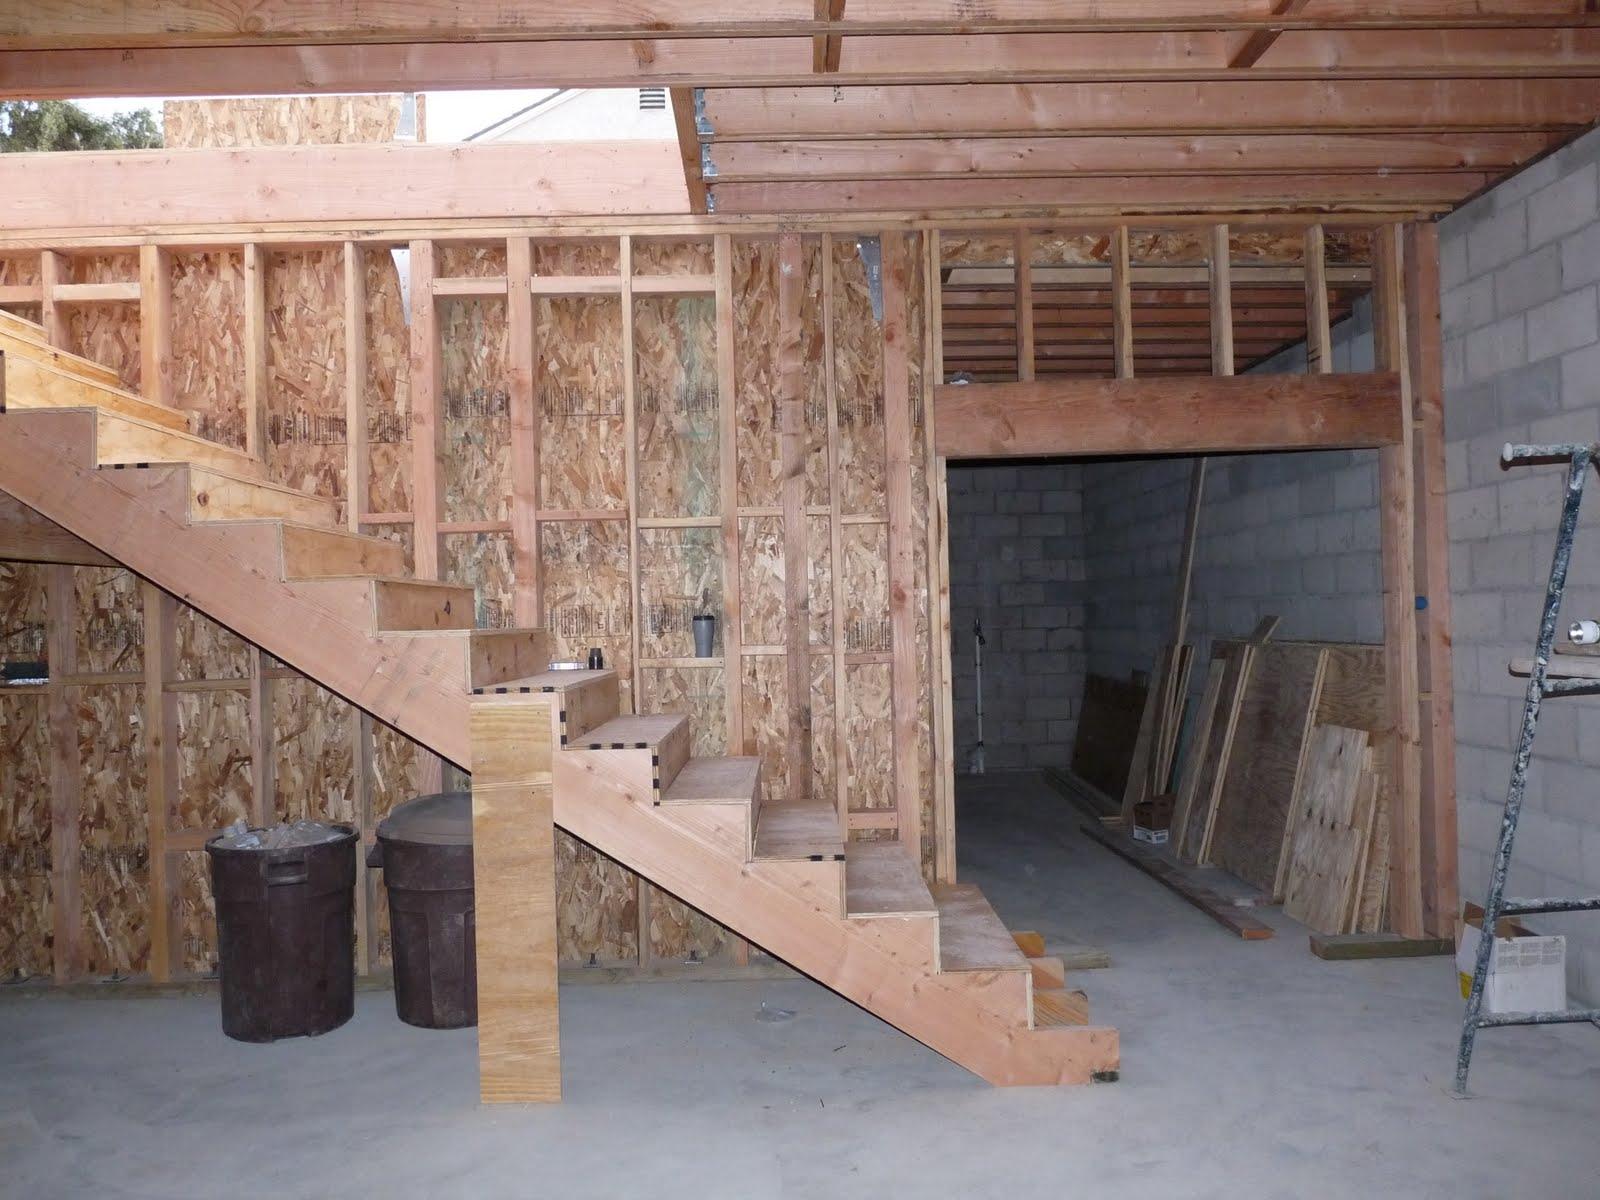 building our new house ha fel p l egyszer a h zunk